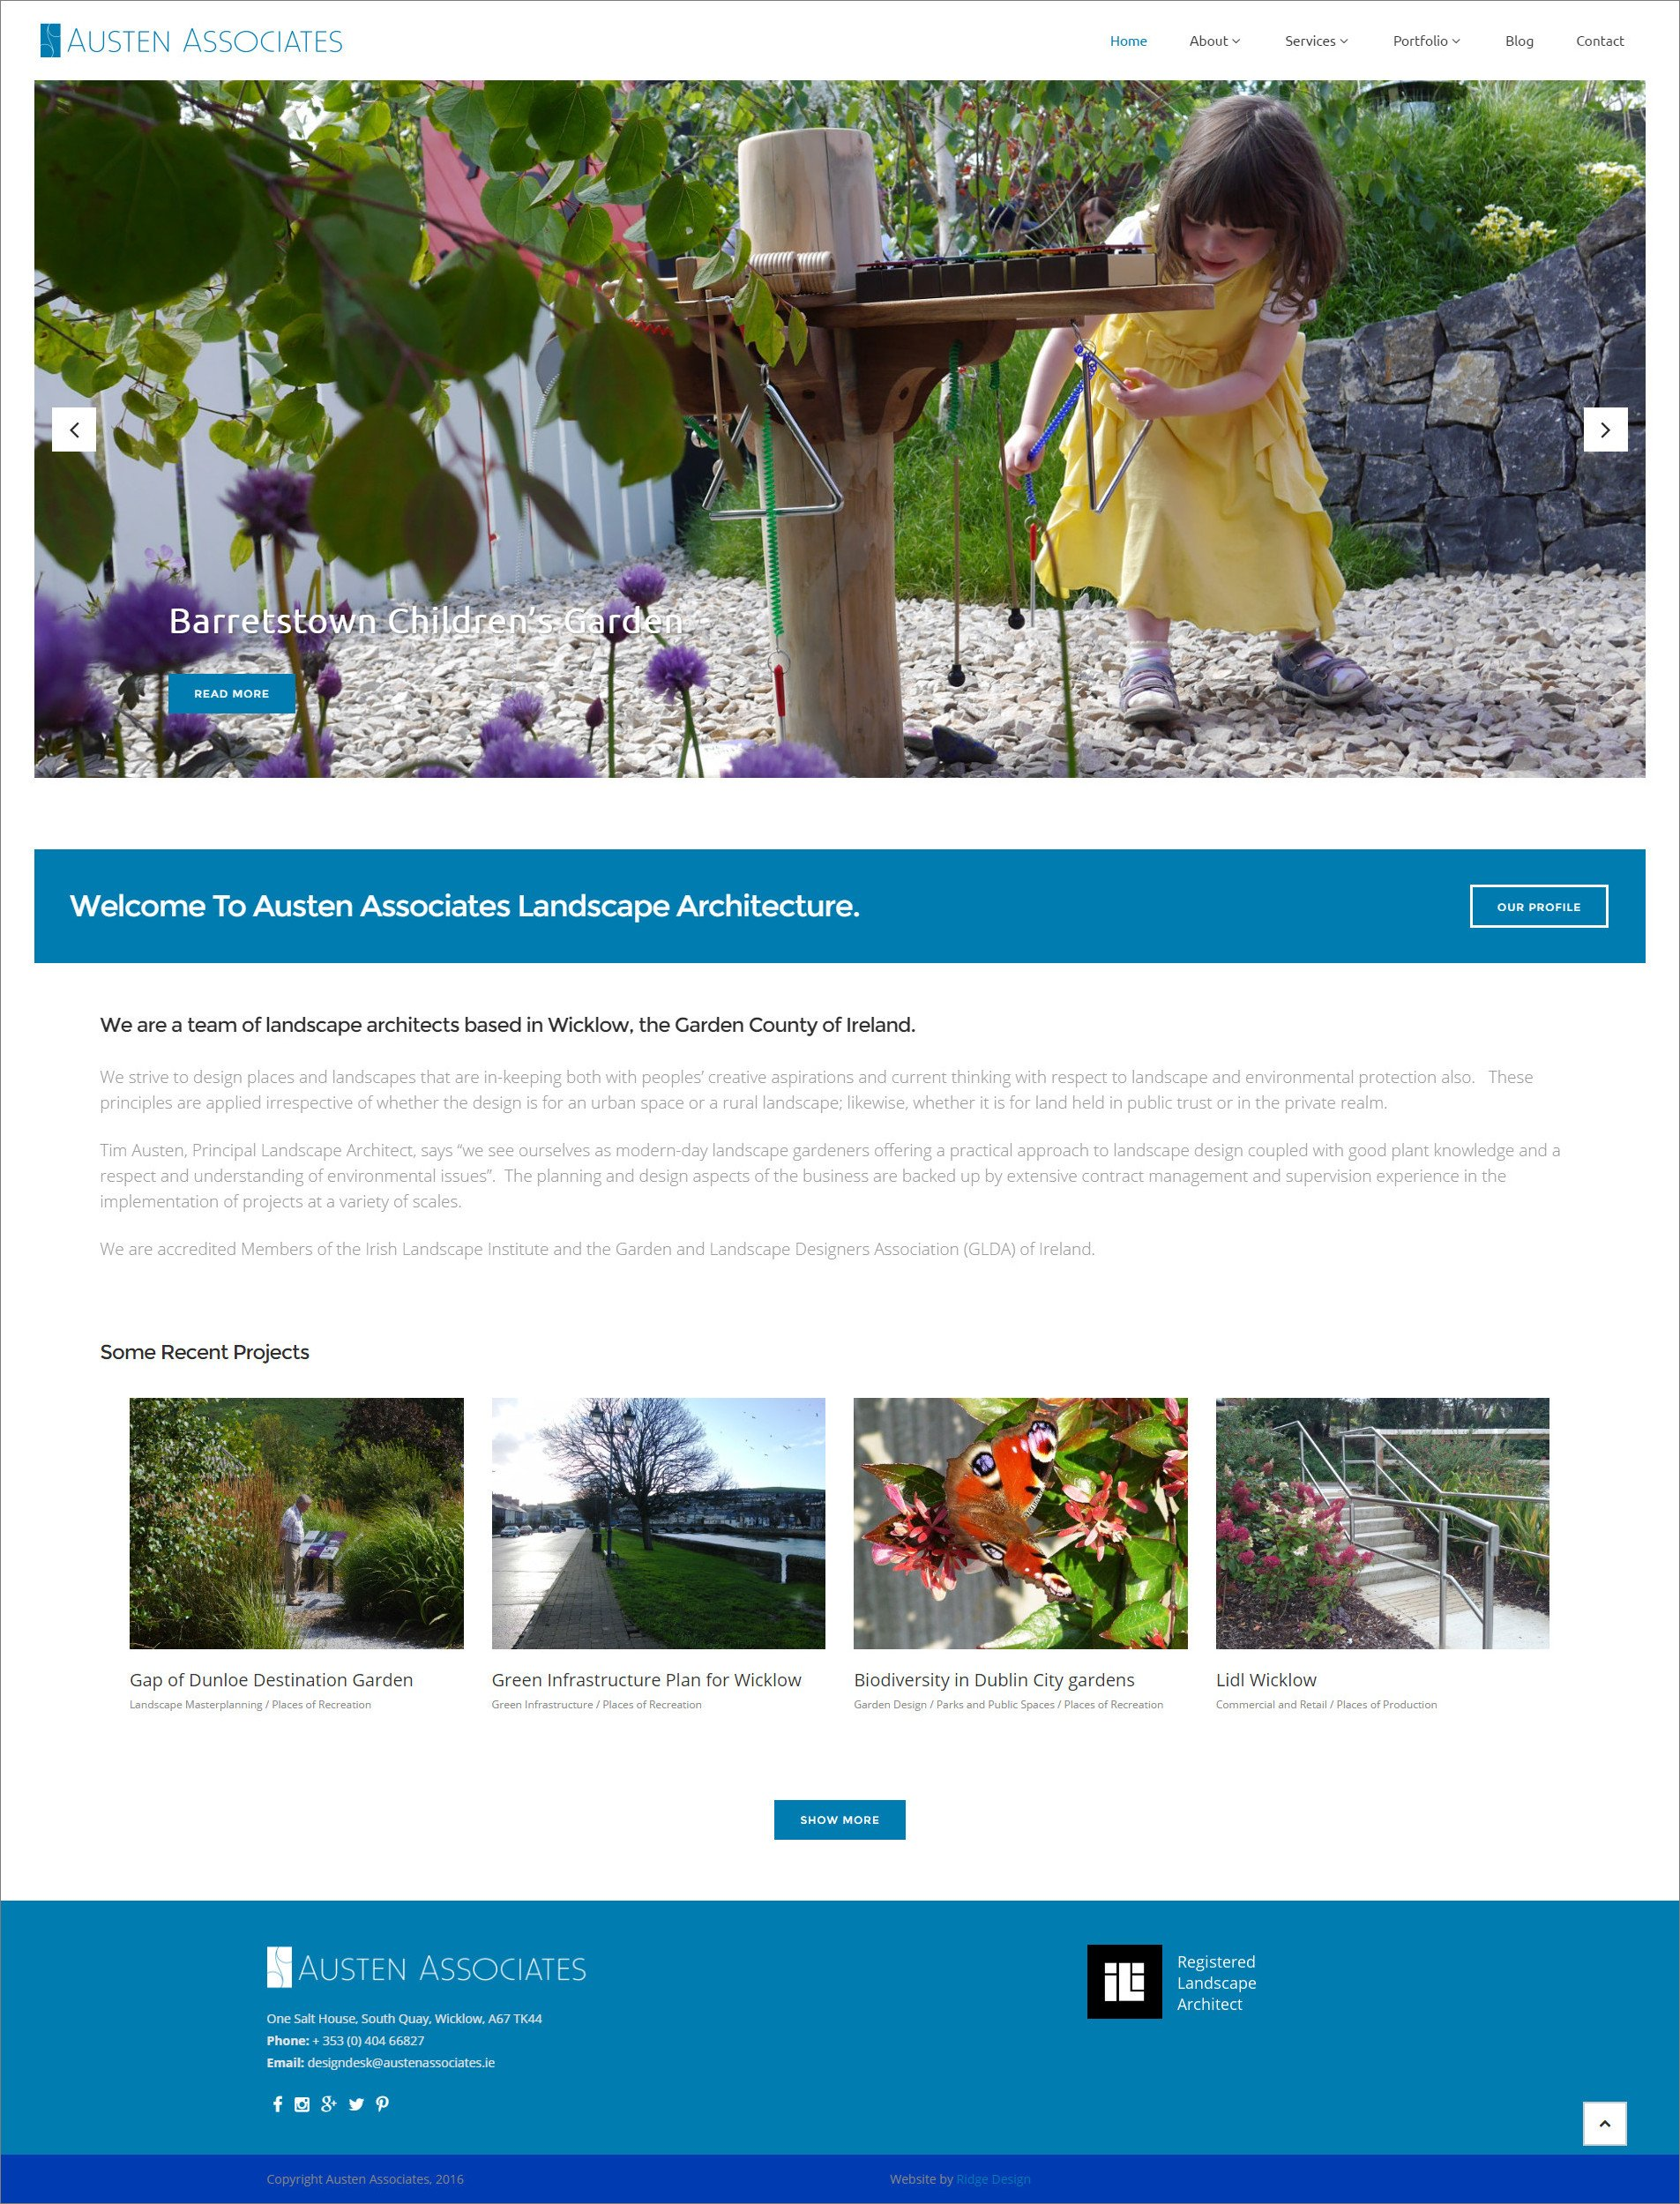 Ridge-Design-Website-Home-design-for-Austen-Associates